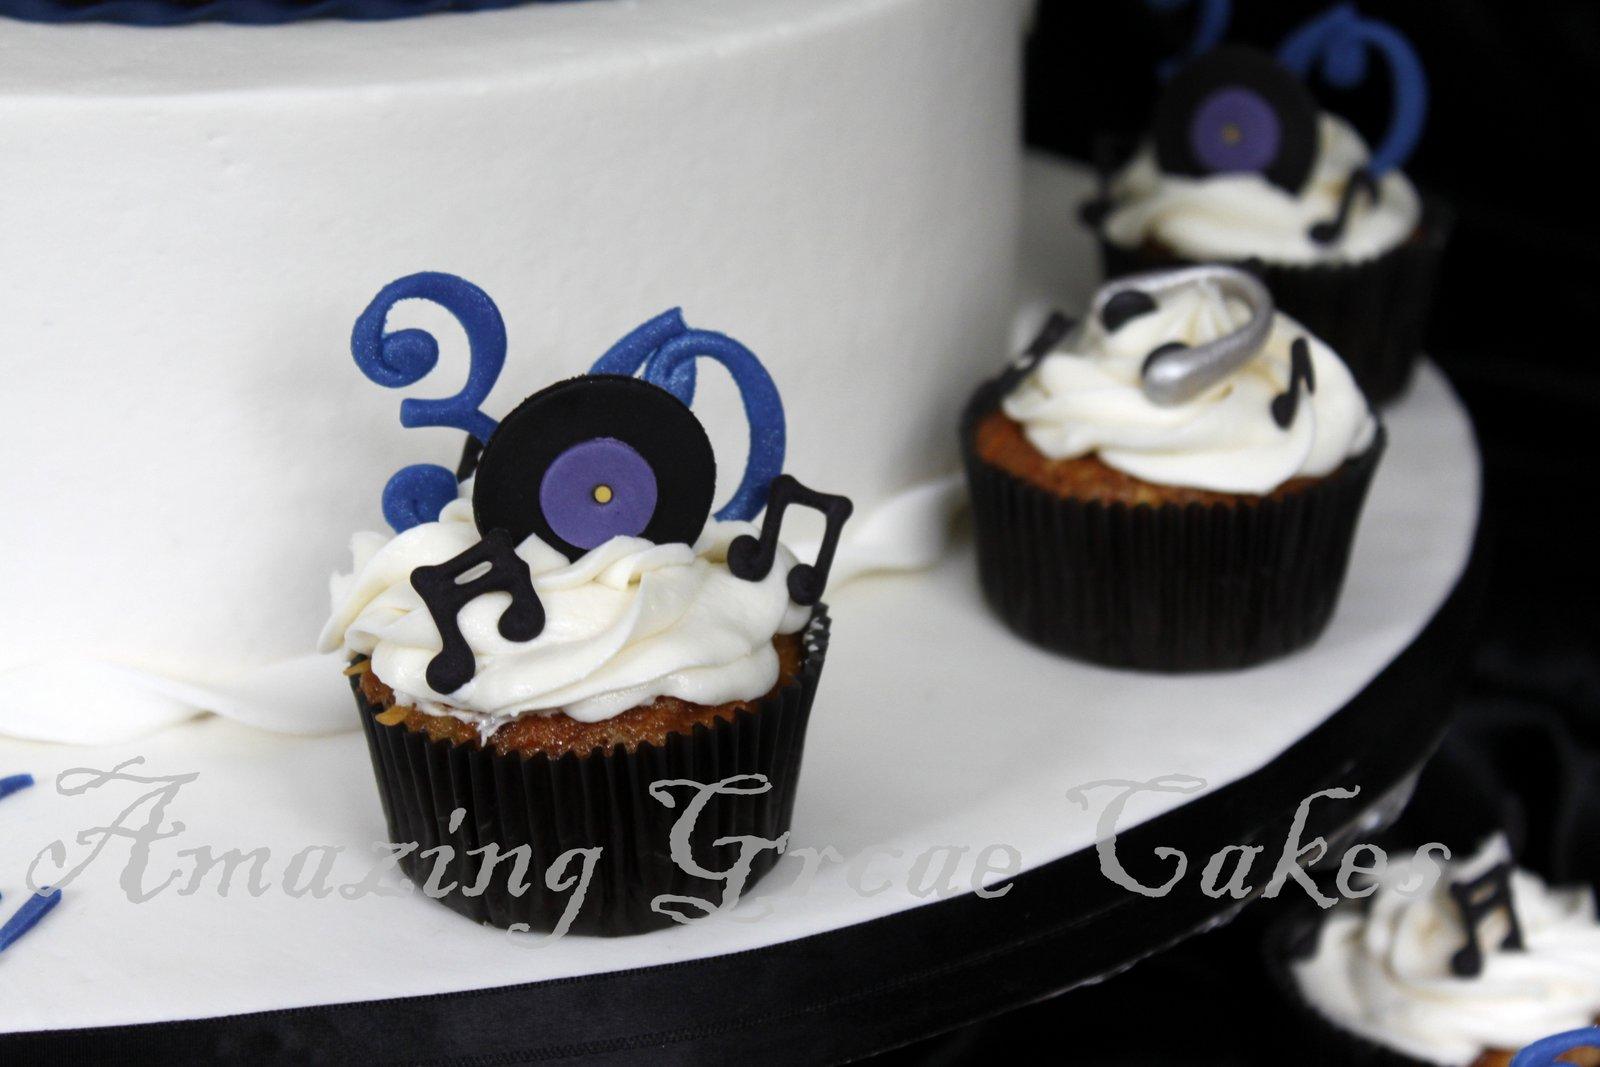 Amazing Grace Cakes DJs 30th Birthday